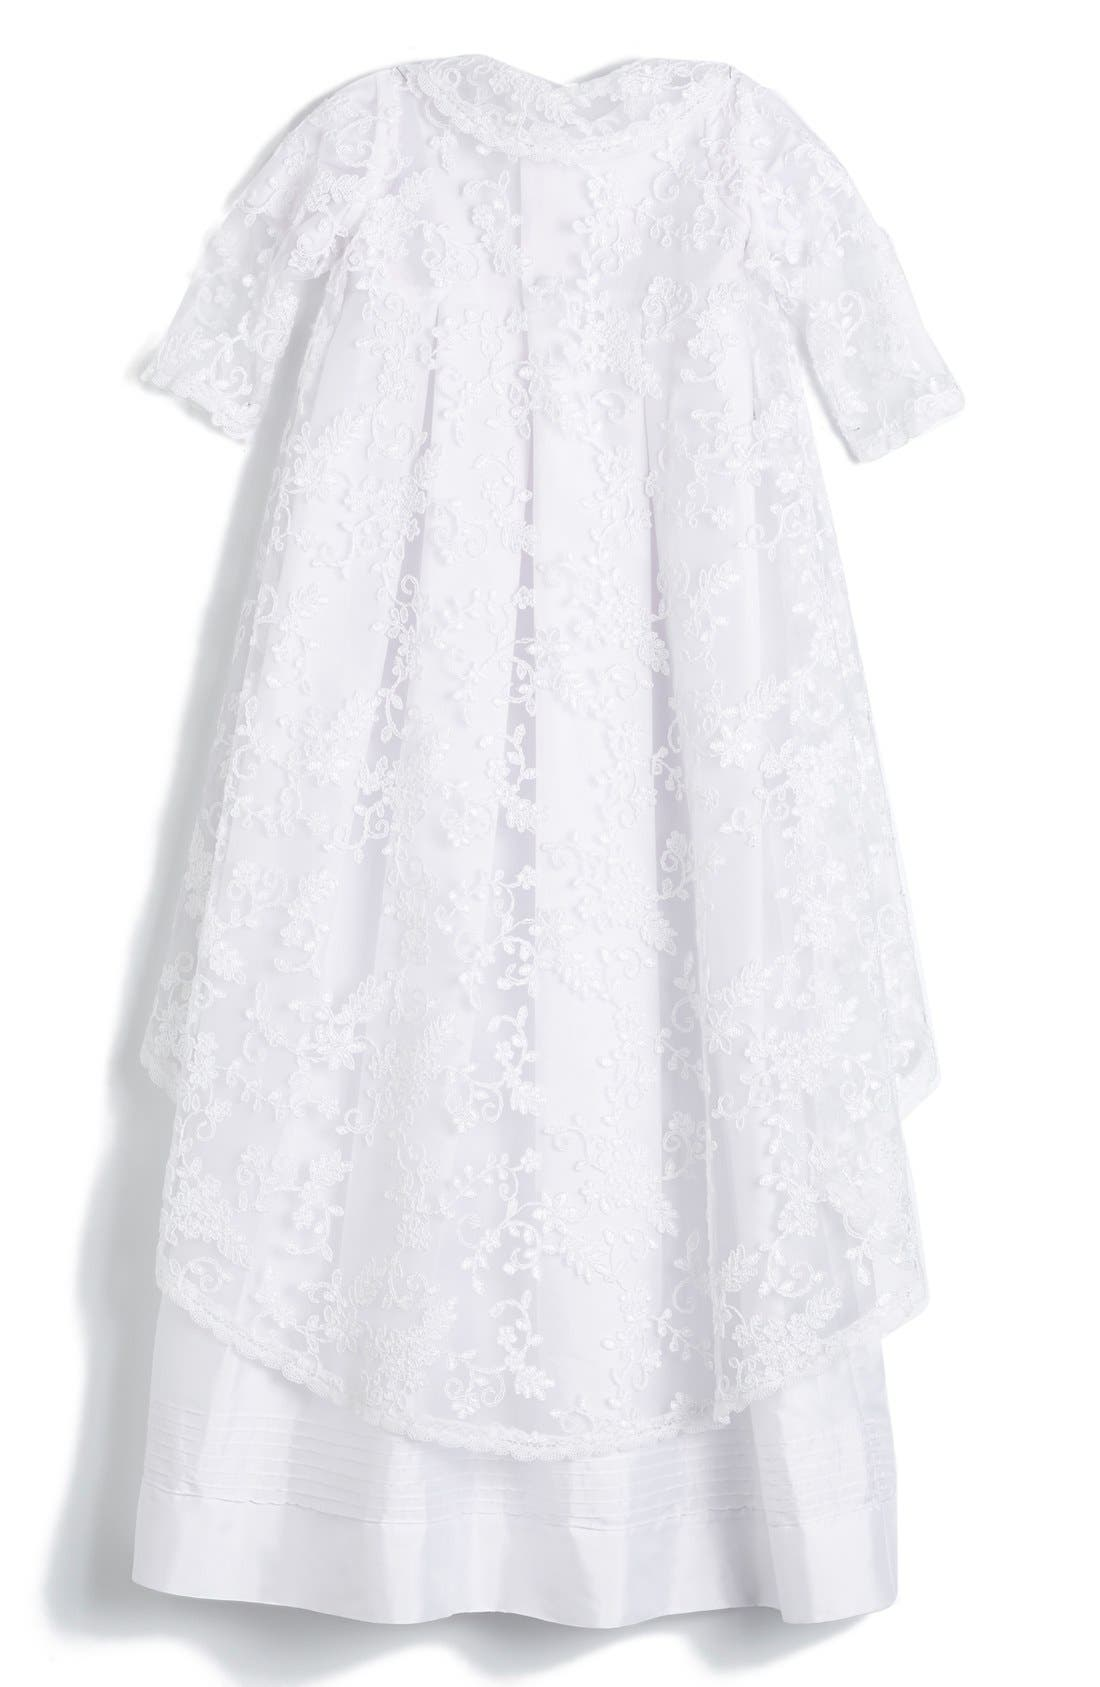 Alternate Image 2  - Isabel Garreton 'Renaissance' Christening Gown & Bonnet (Baby)